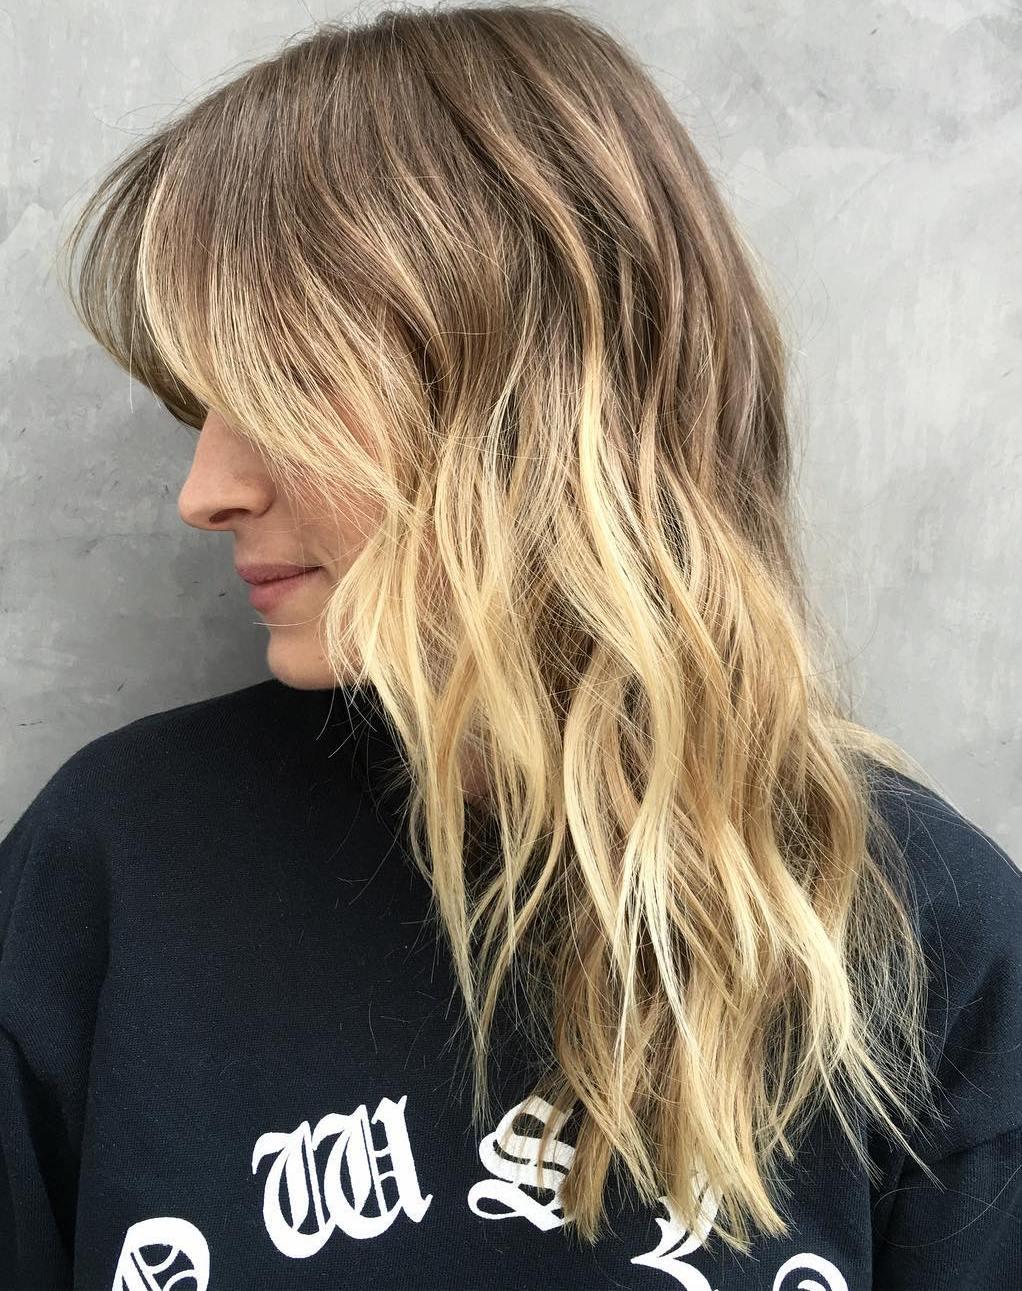 Beachy Bronde Layered Hair with Waves